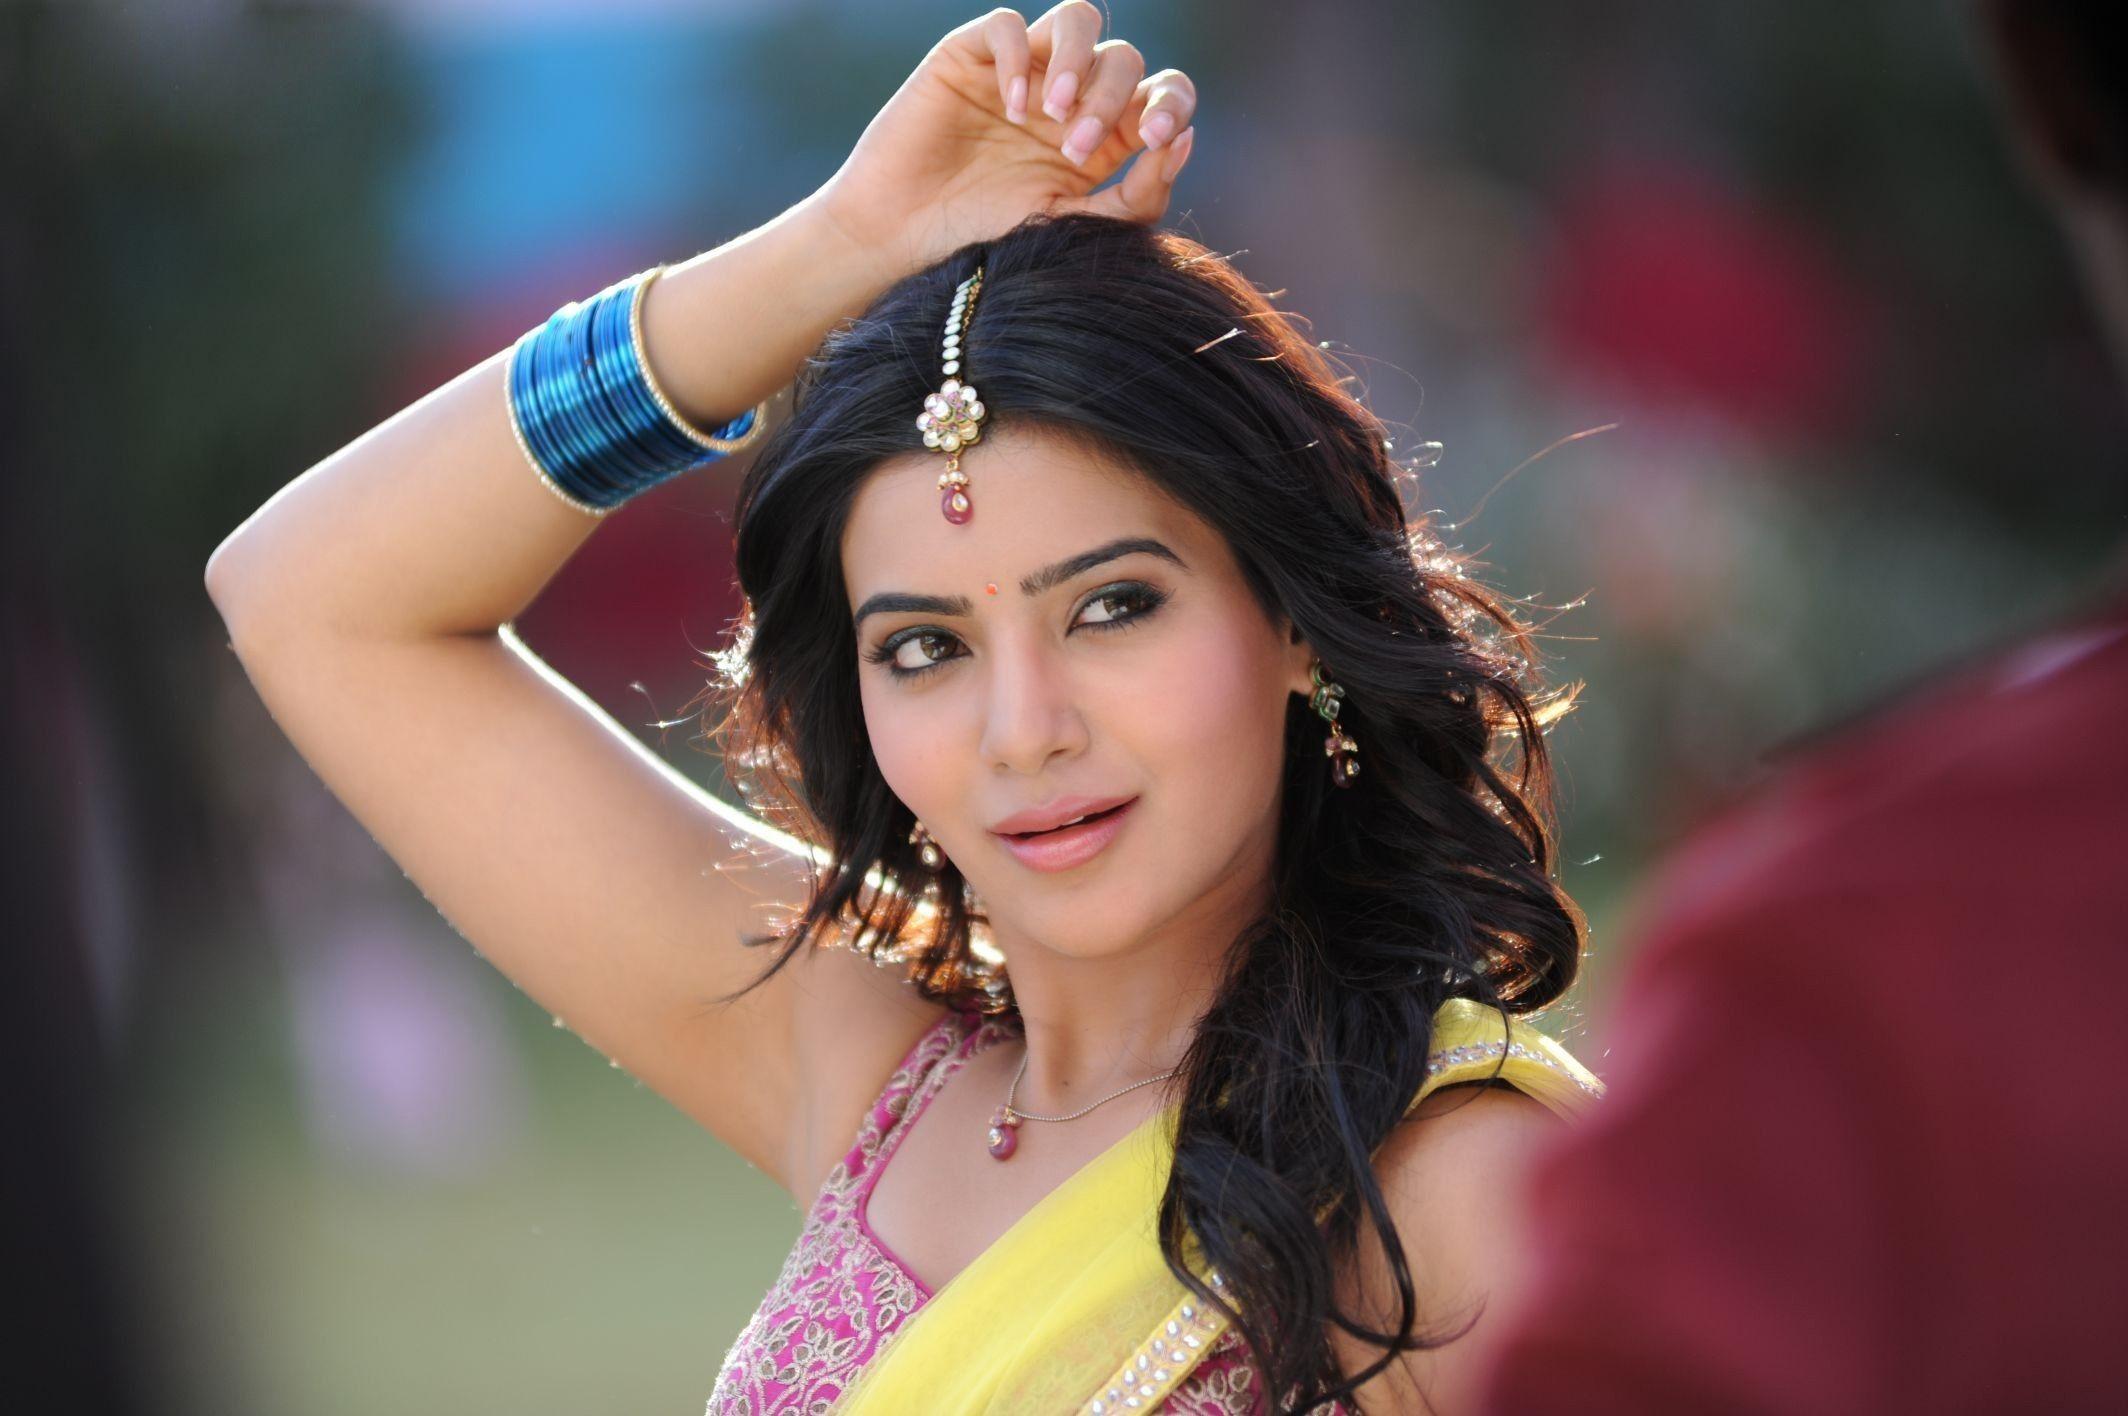 Full Hd Calendar Girls Wallpapers 1080p Desktop Full Hd Wallpapers Bollywood Actress 183 ① Wallpapertag